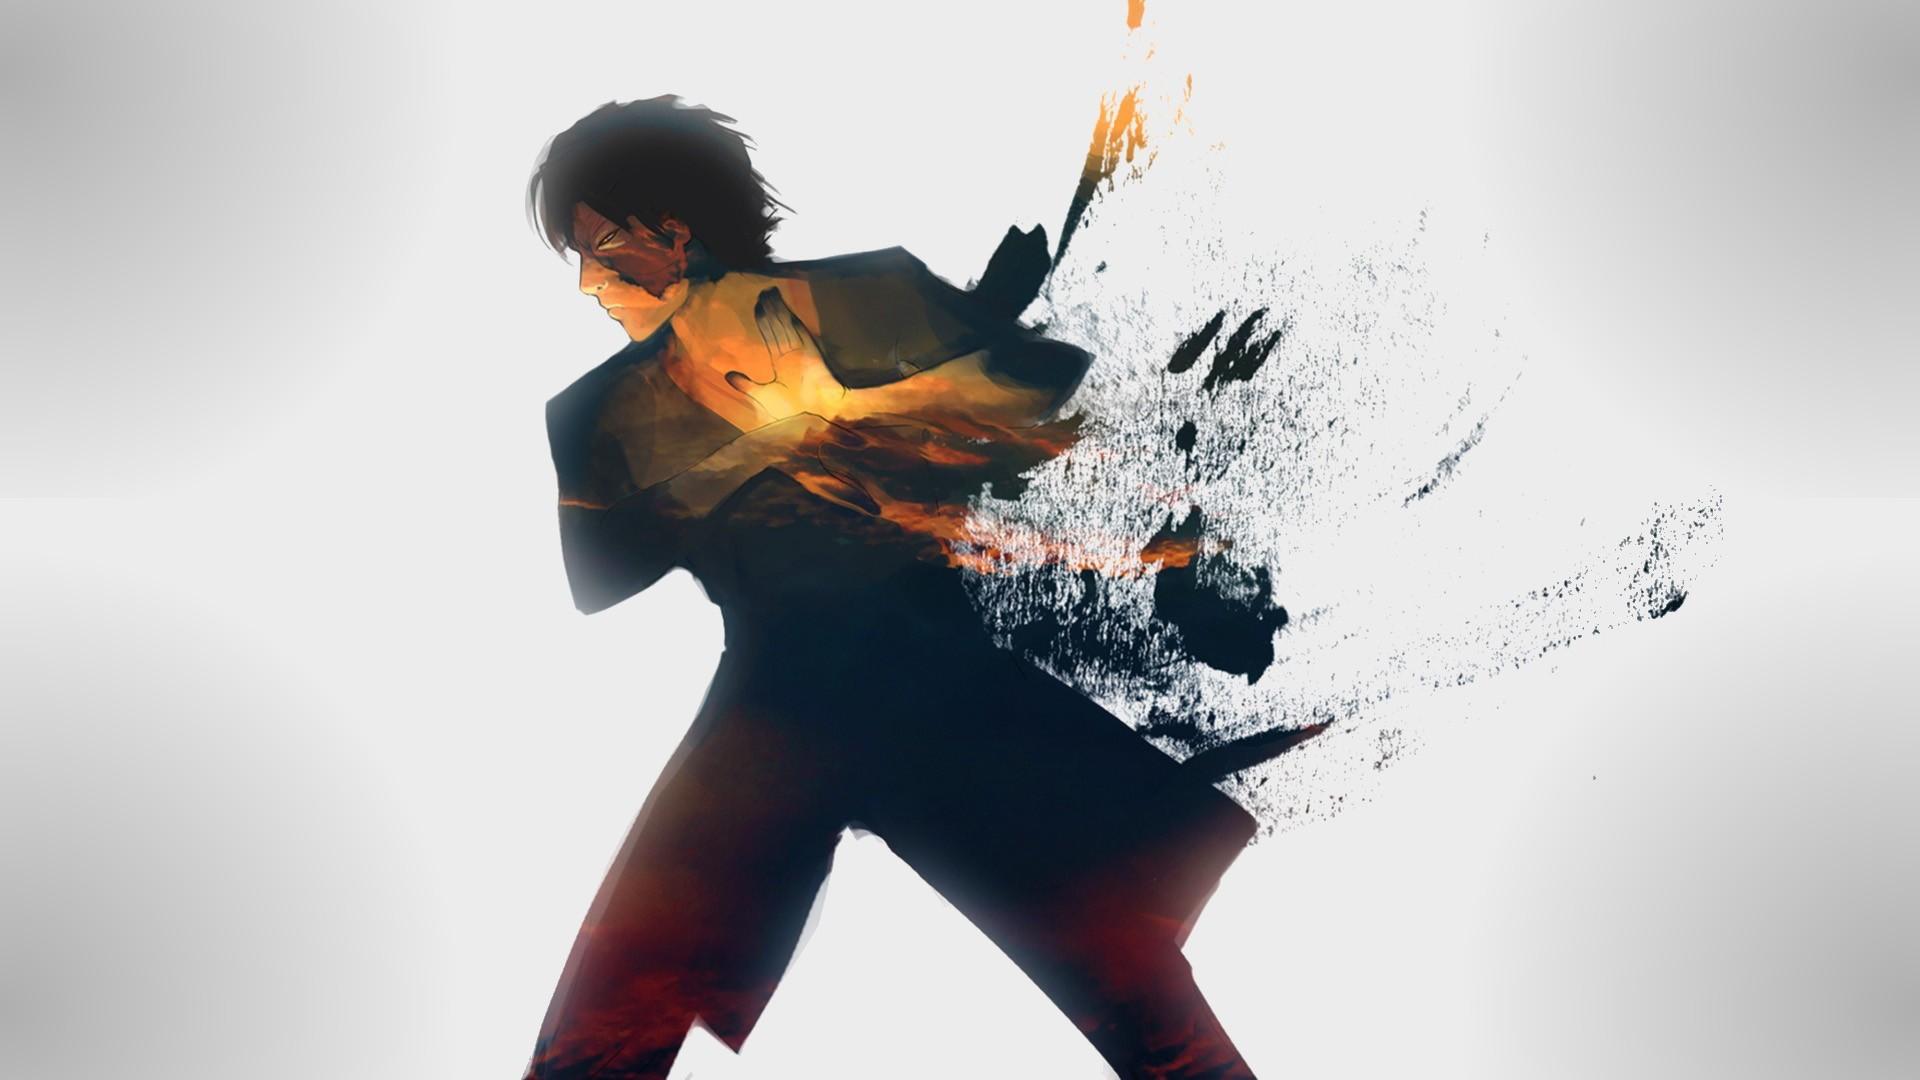 Anime Avatar The Last Airbender Prince Zuko Guitarist Dance Photo Shoot Modern